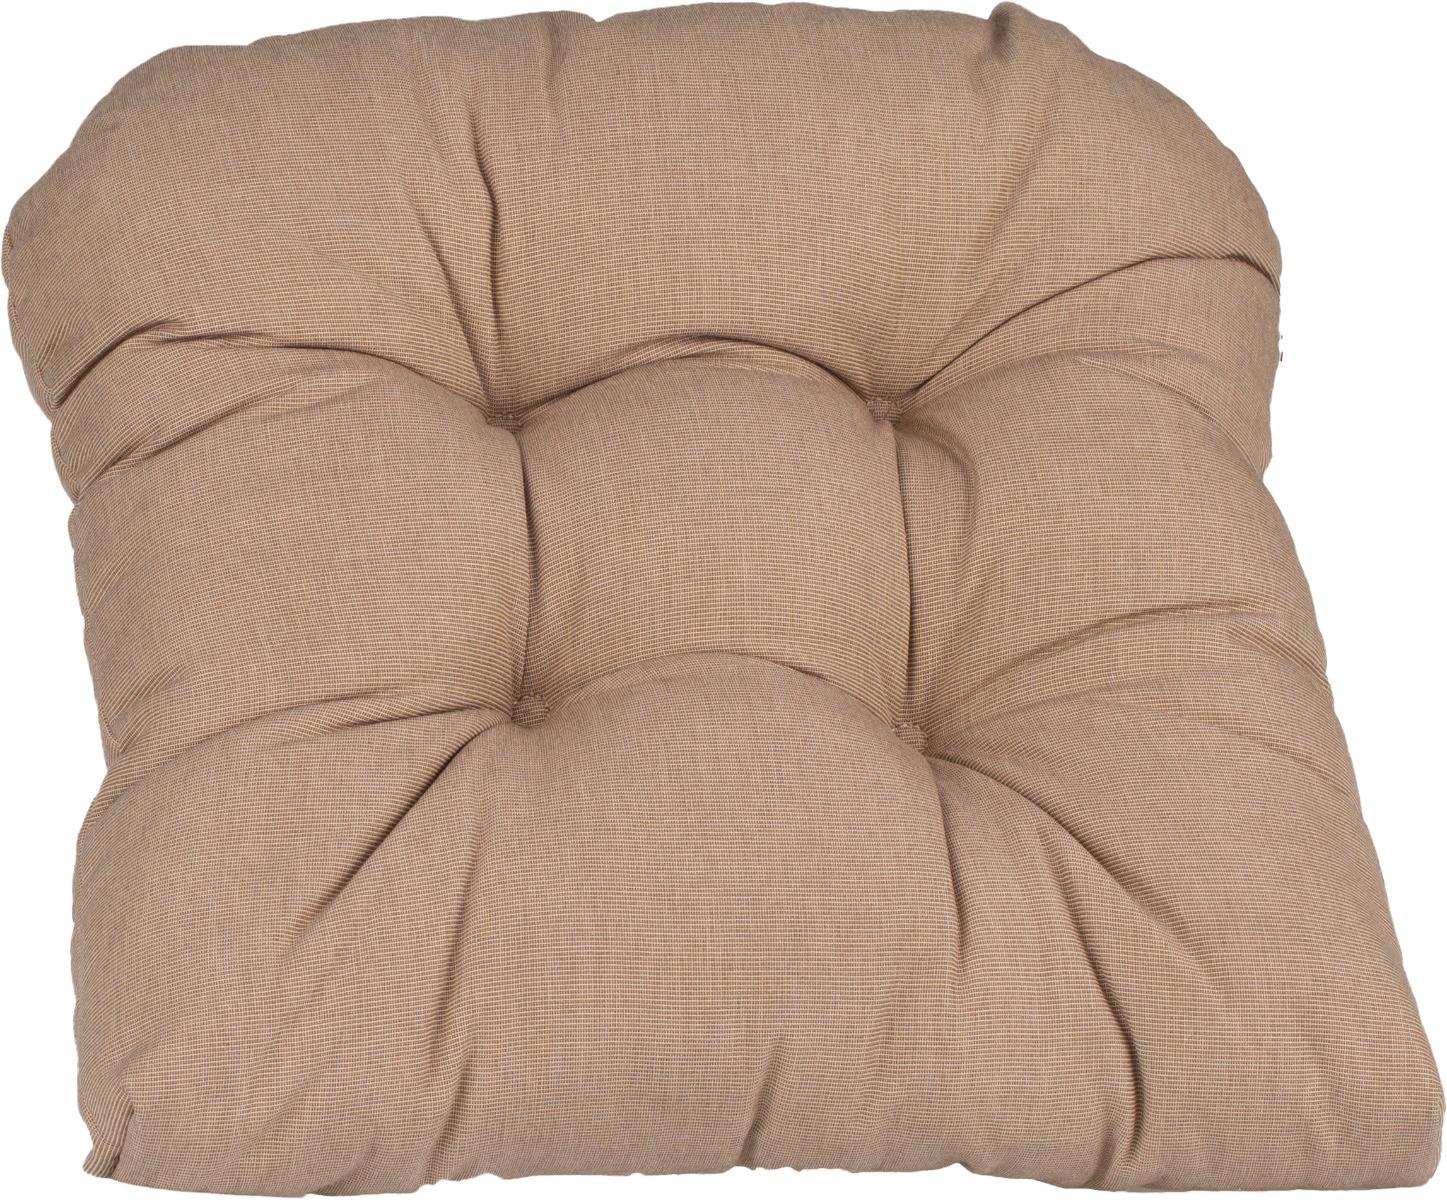 beo Sarah Sitzkissen halbrund ca. 38x42 cm in dunkelbeige mit Reissverschluss